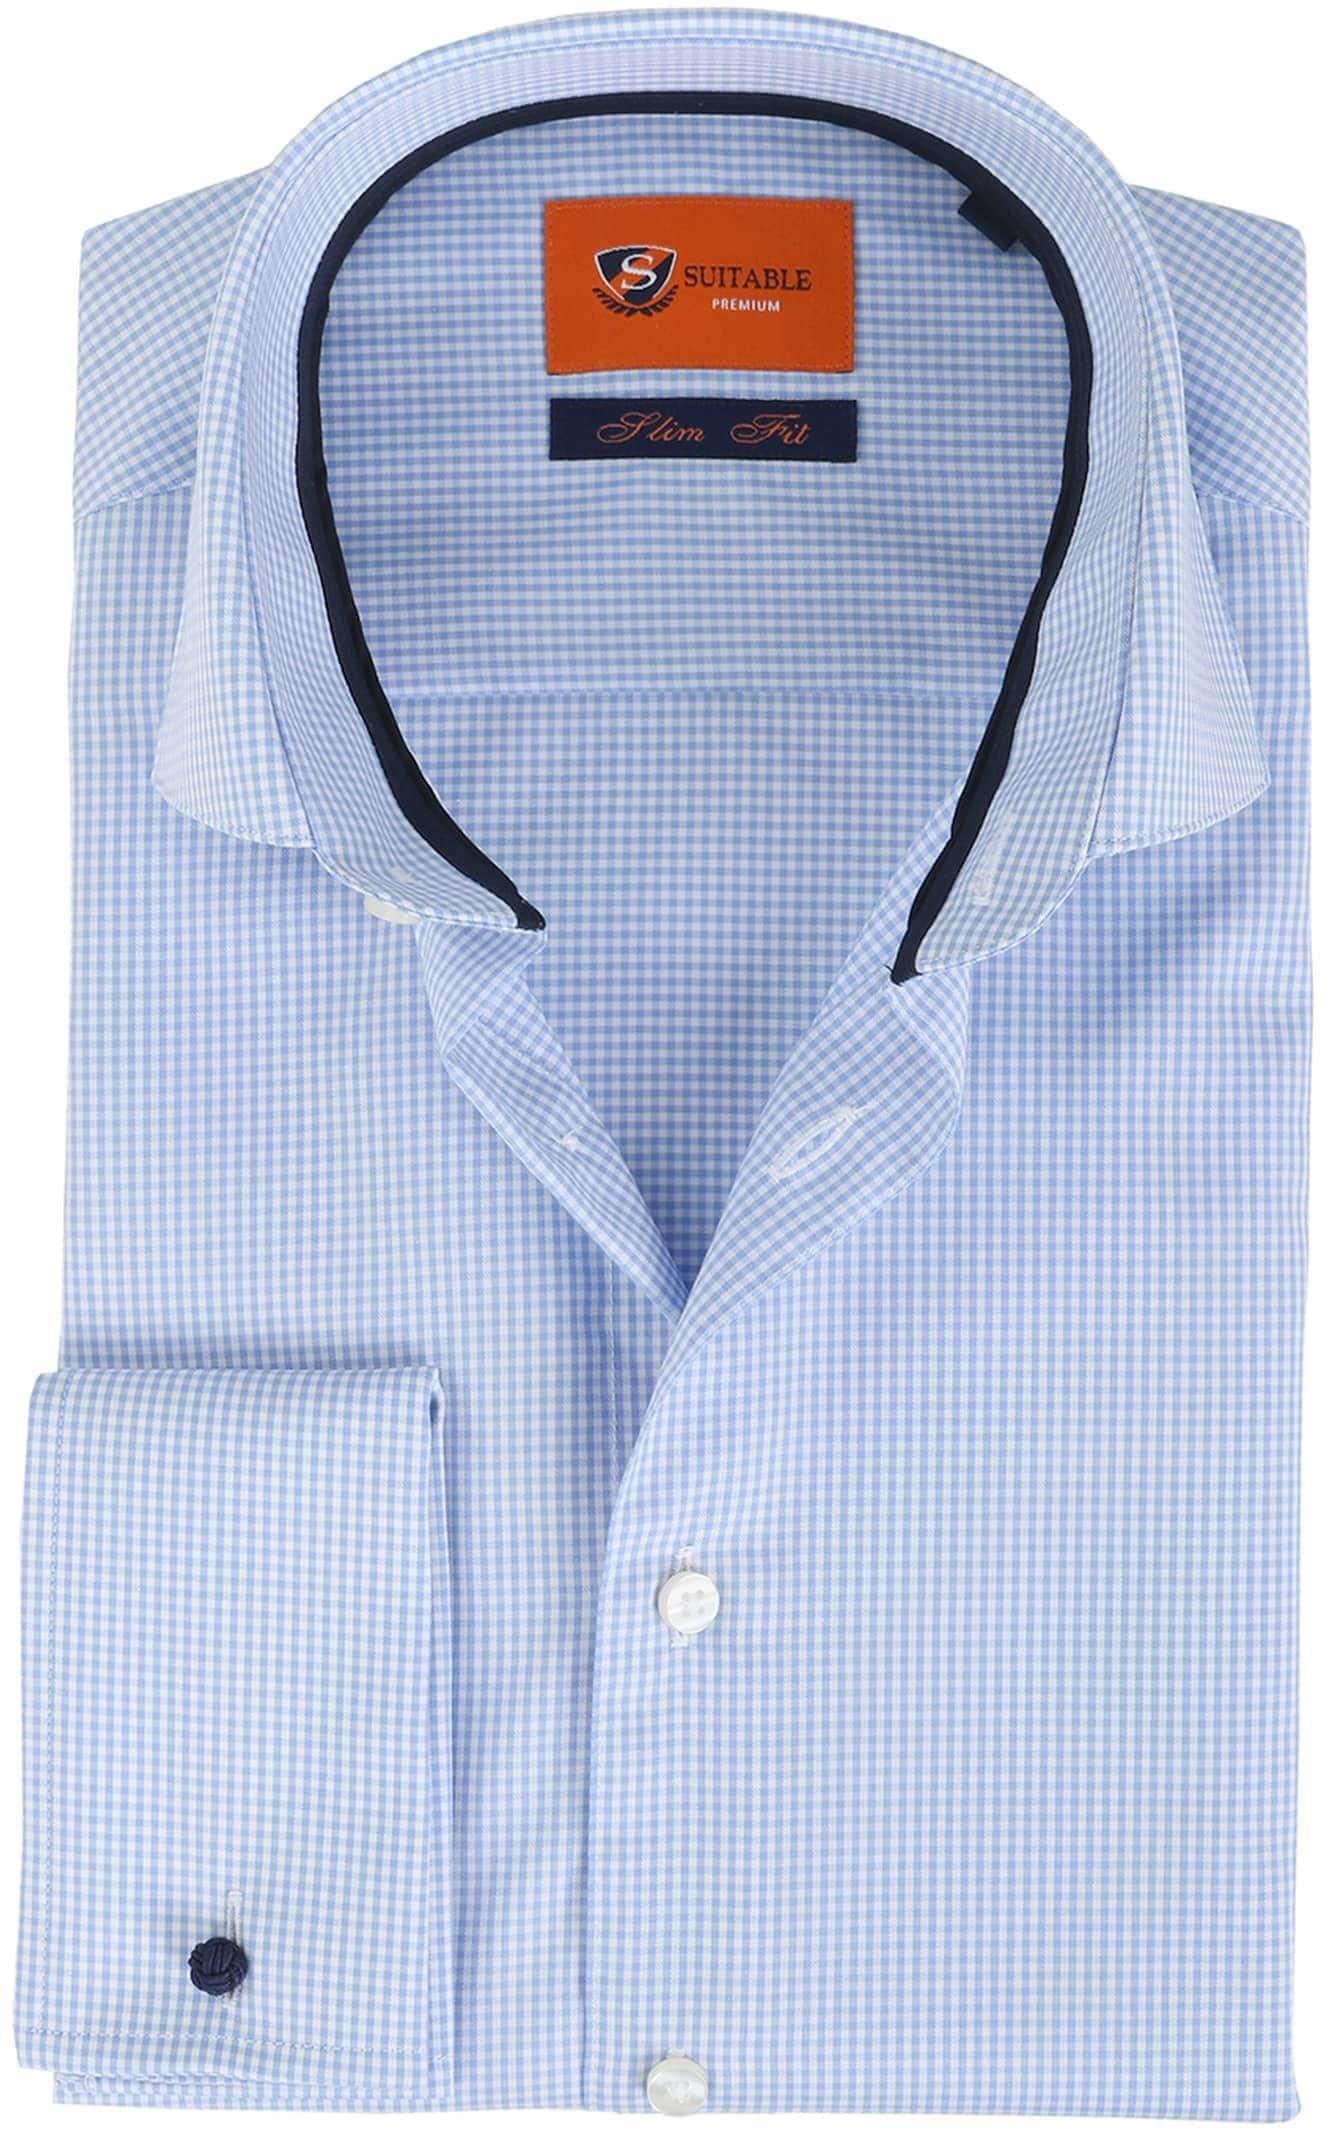 Suitable Hemd Blau Karo foto 0